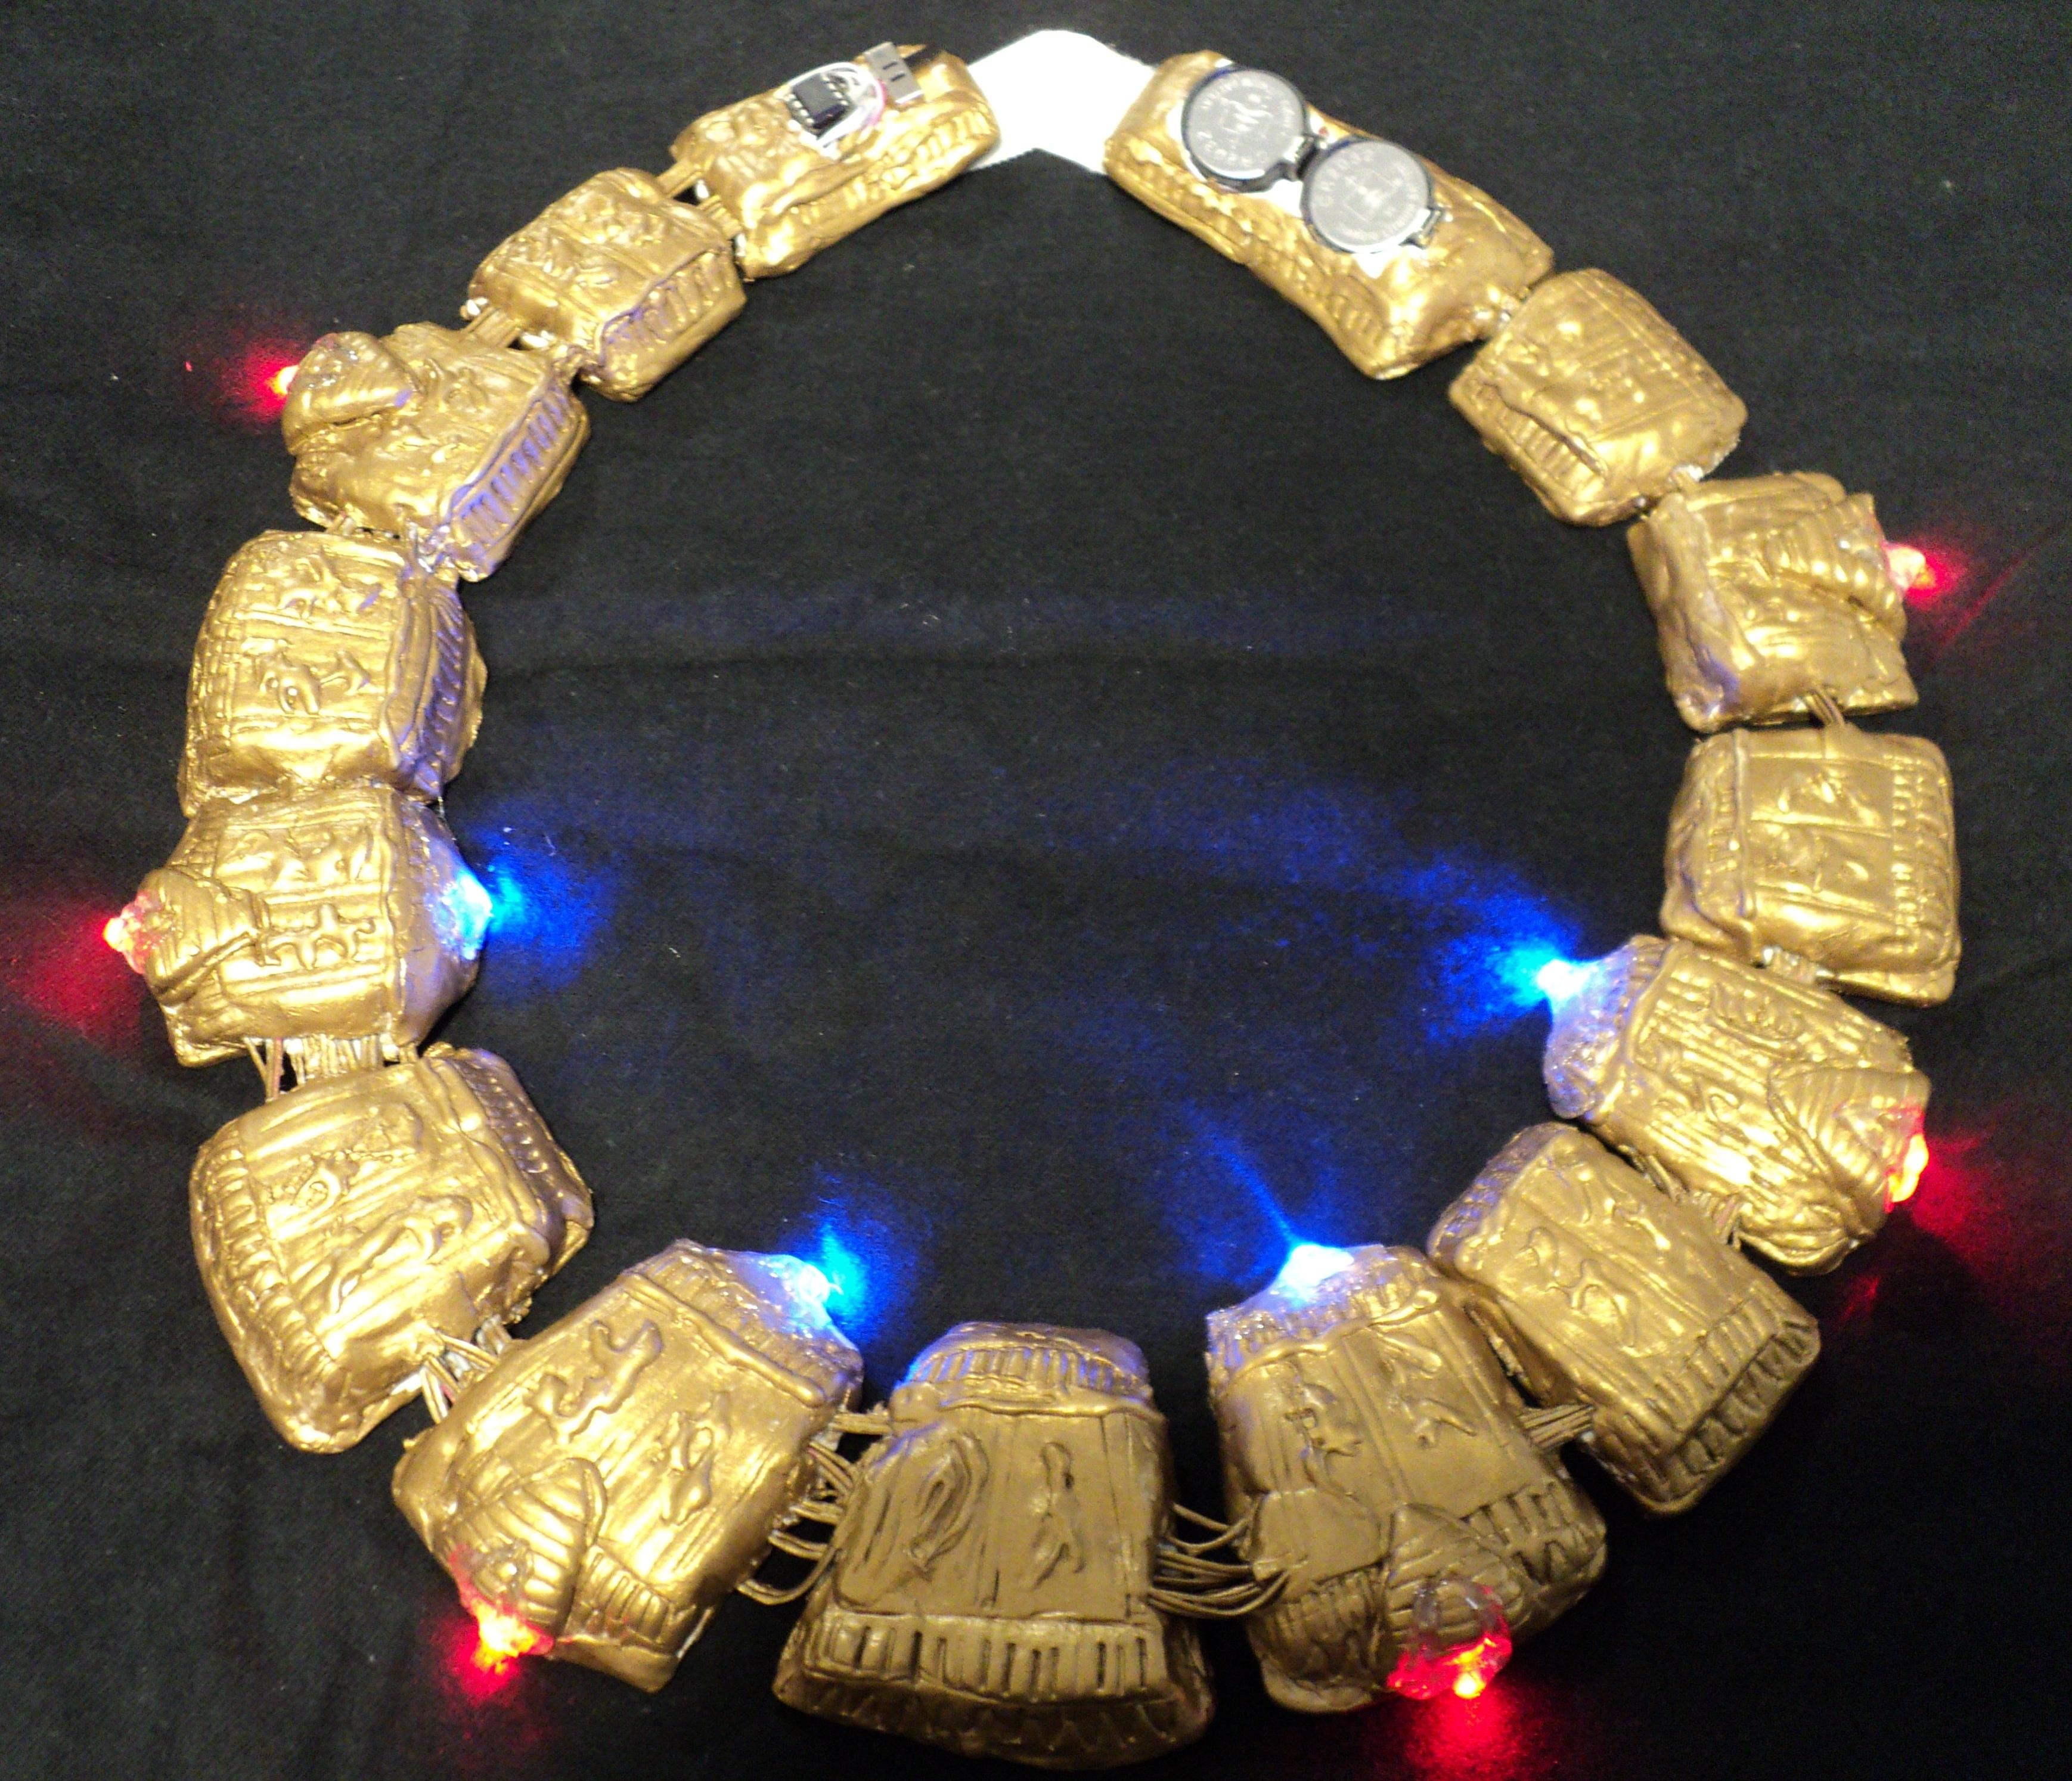 Stargate LED Lighted Necklace